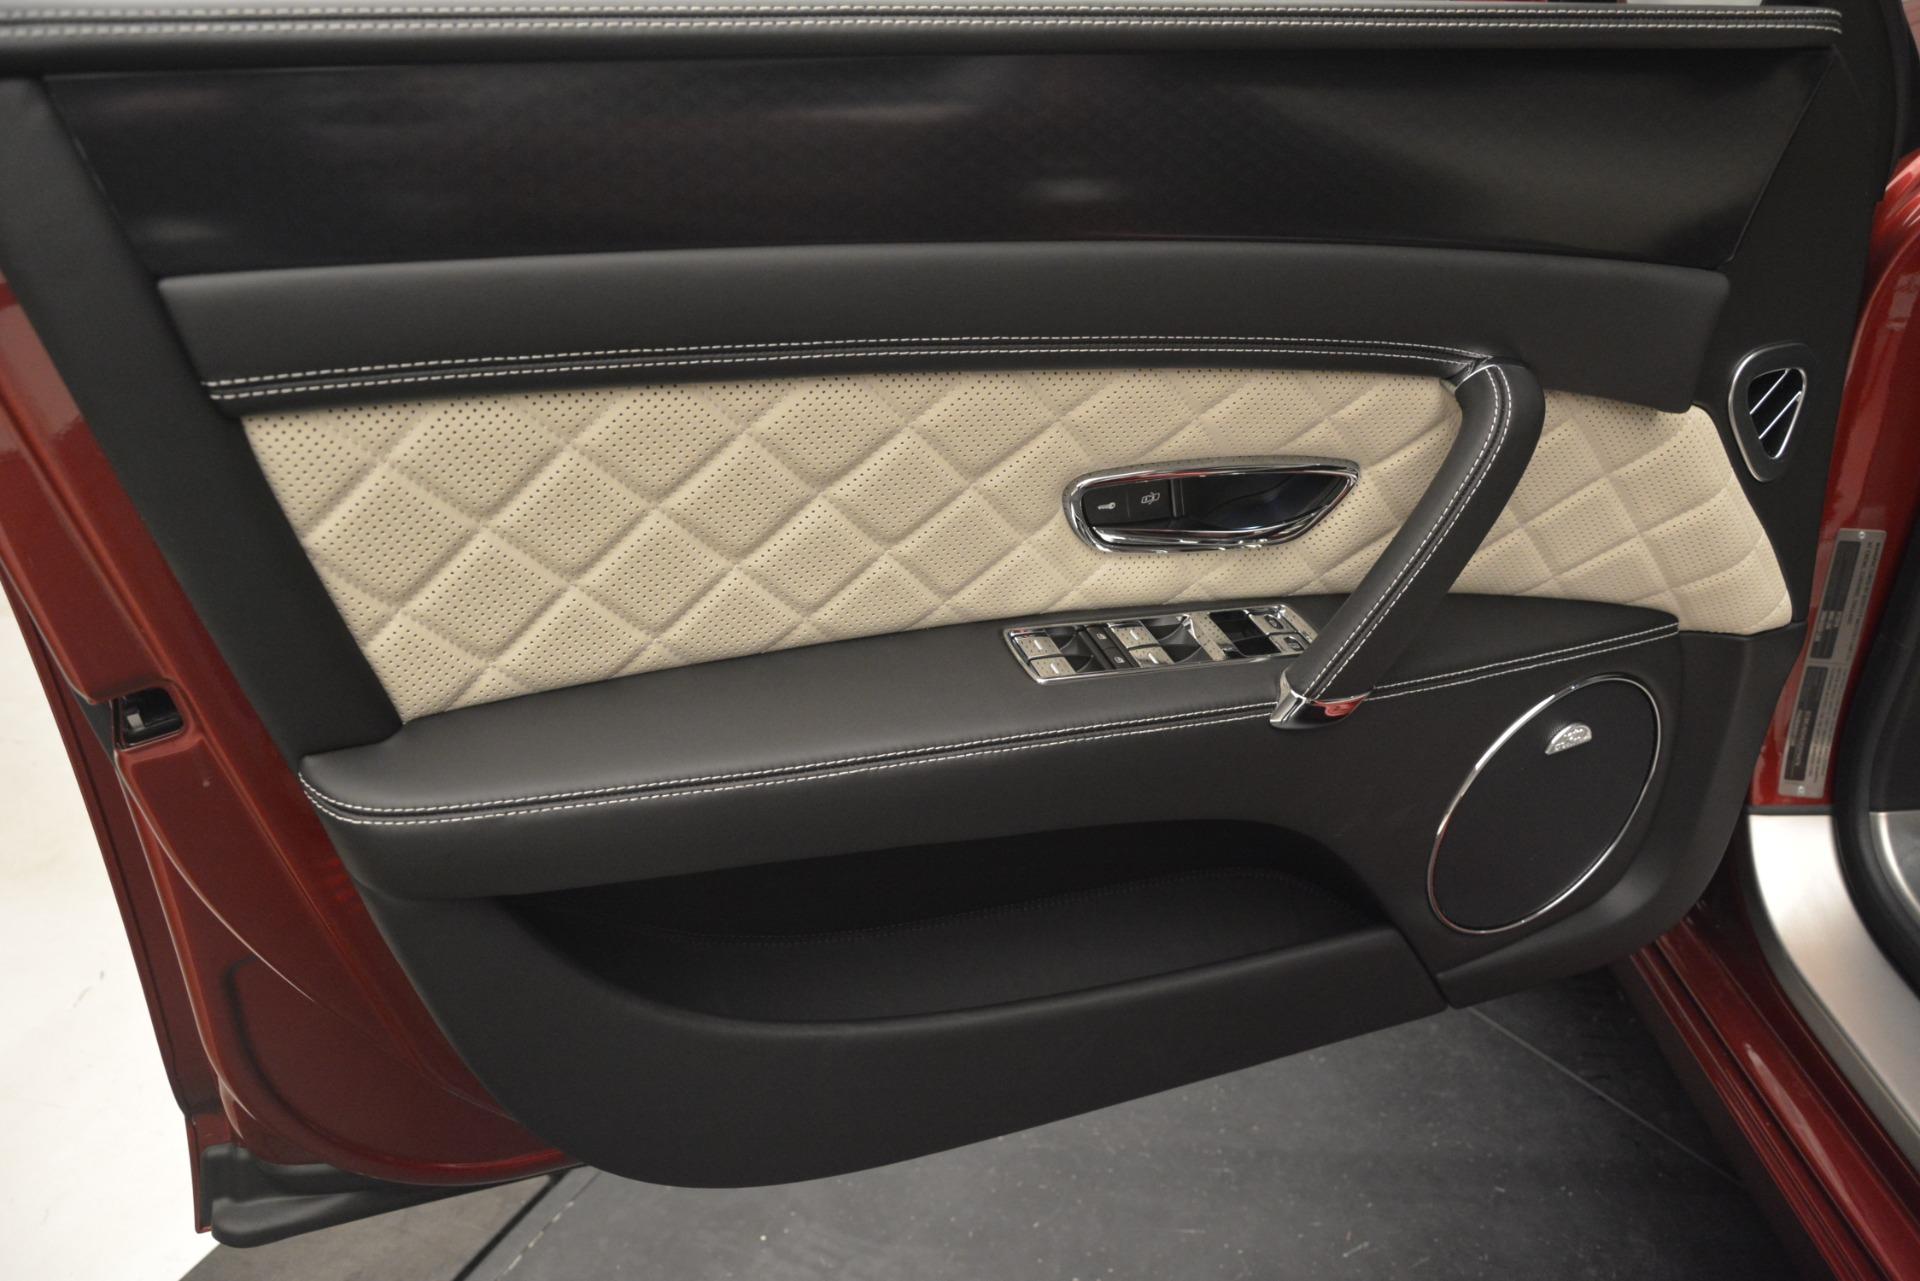 Used 2018 Bentley Flying Spur W12 S For Sale In Westport, CT 3014_p16